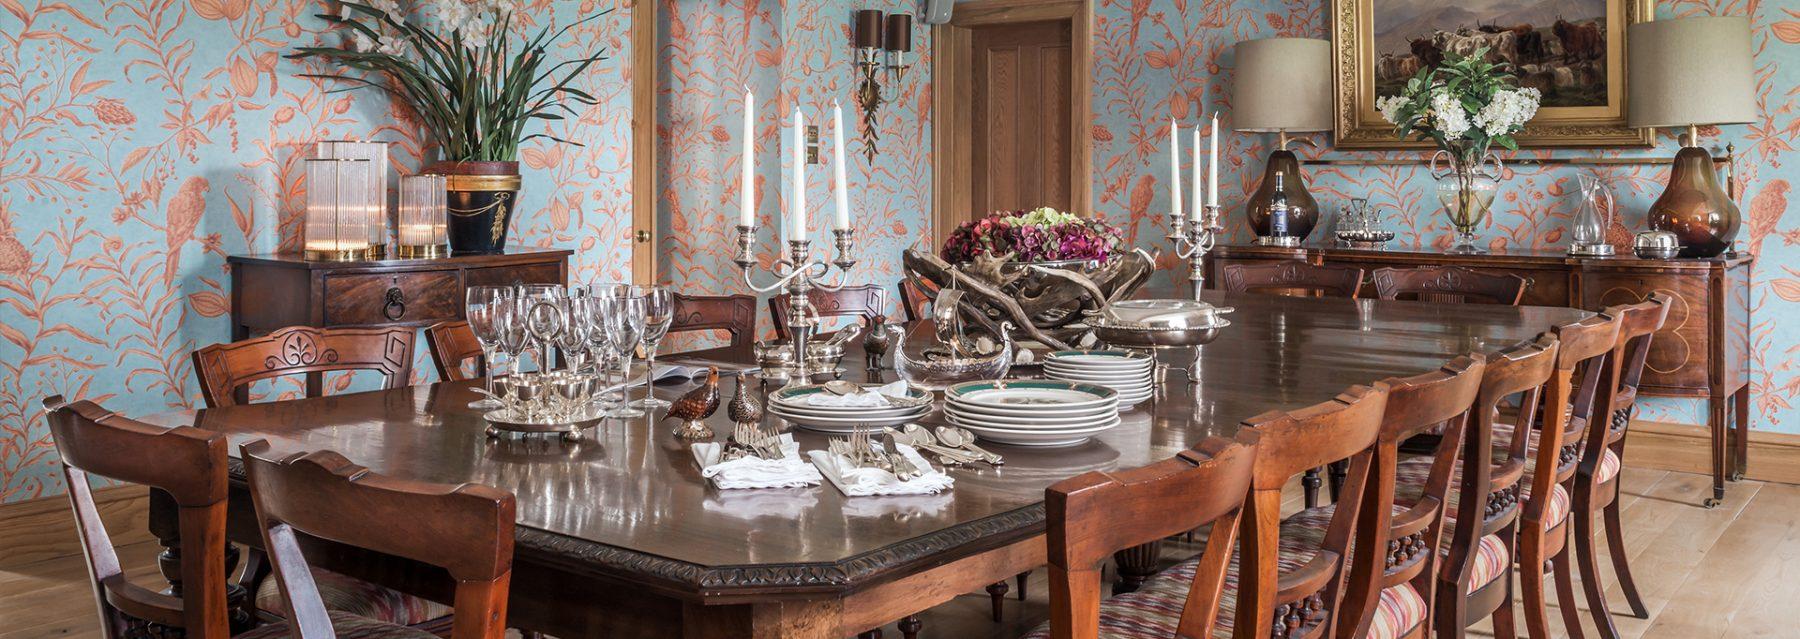 Laudale Estate Scotland Interior Design Dining Room Wooden Furniture Photograph